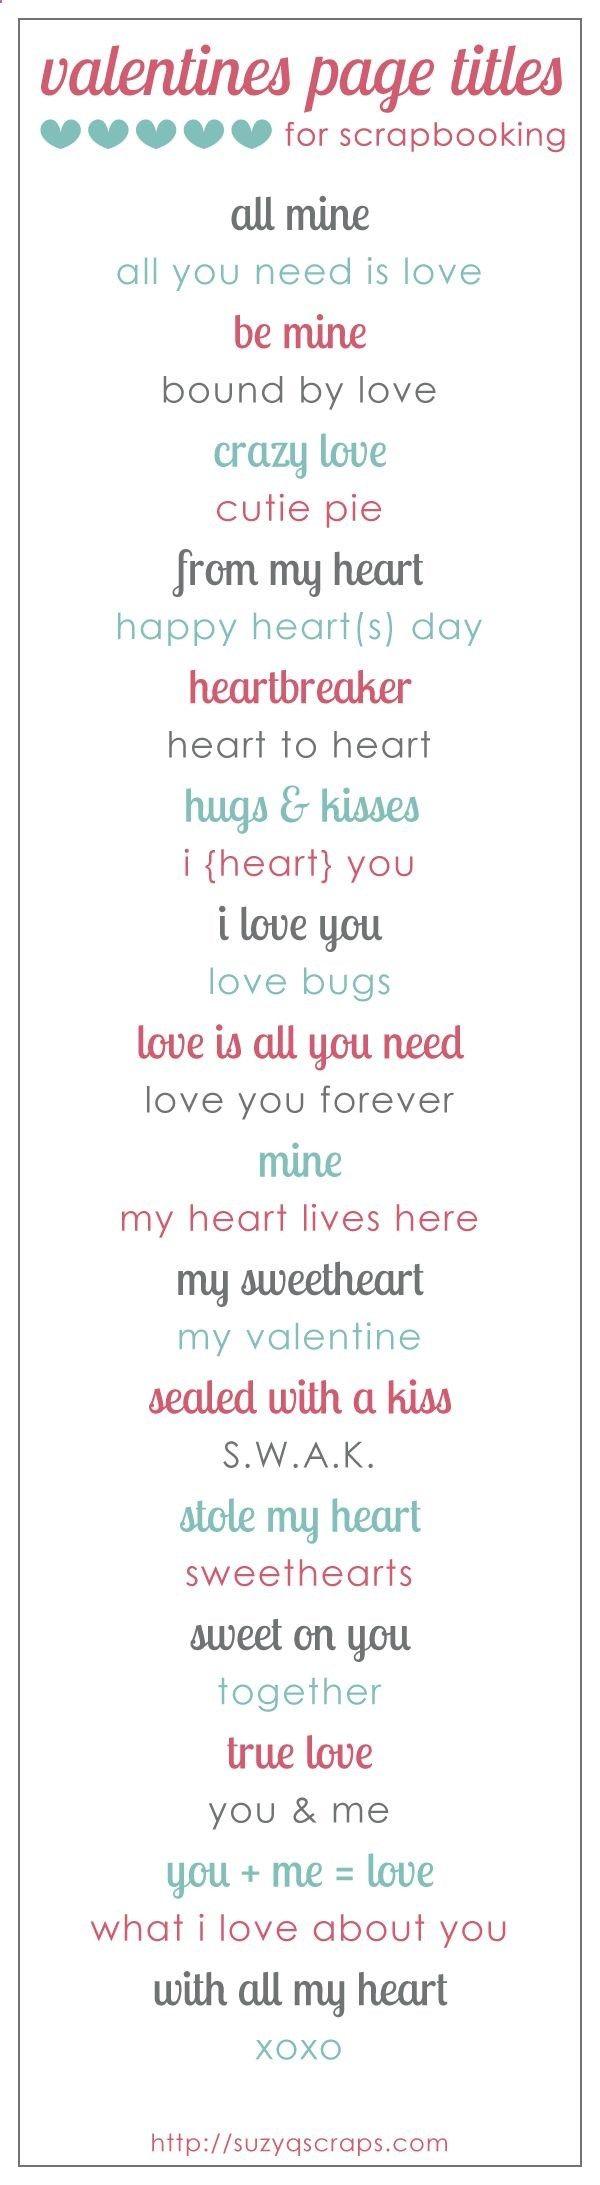 valentines and love scrapbook ideas | valentines scrapbook page titles